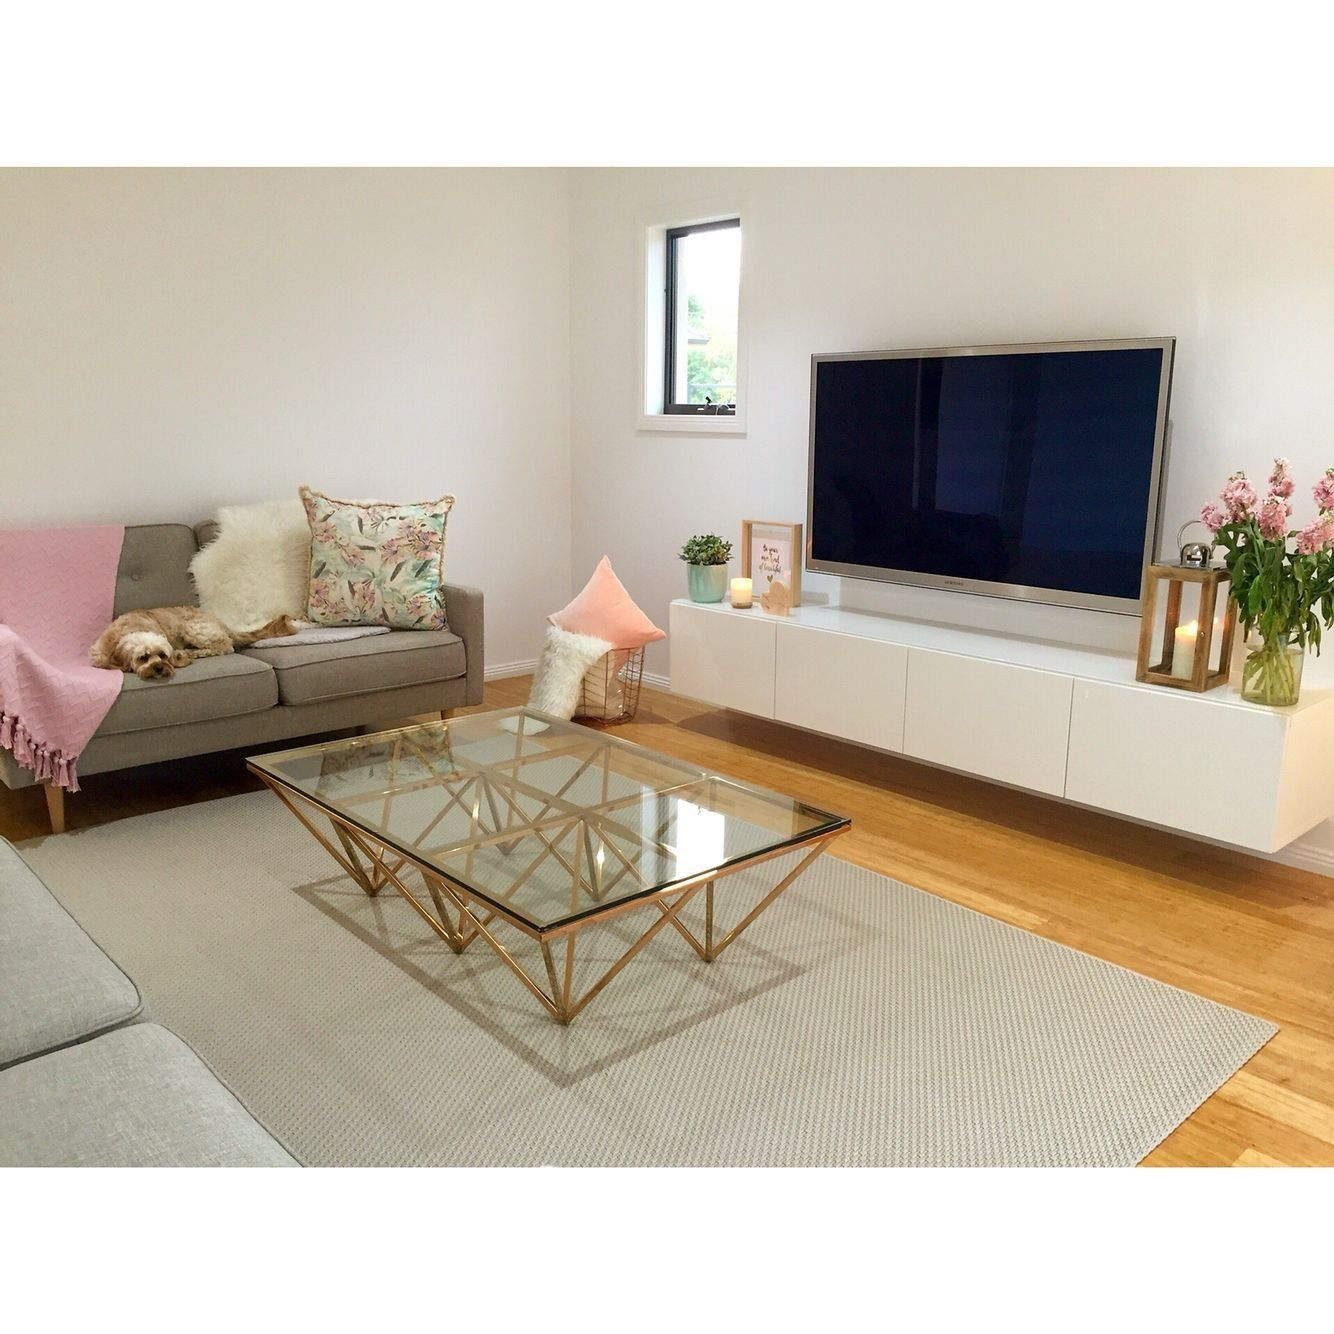 Living Room Ideas Tv Stand Contemporary Scandinavian Decor Copper Coffee Table Living Room Tv Stand Living Room Tv Living Room Coffee Table